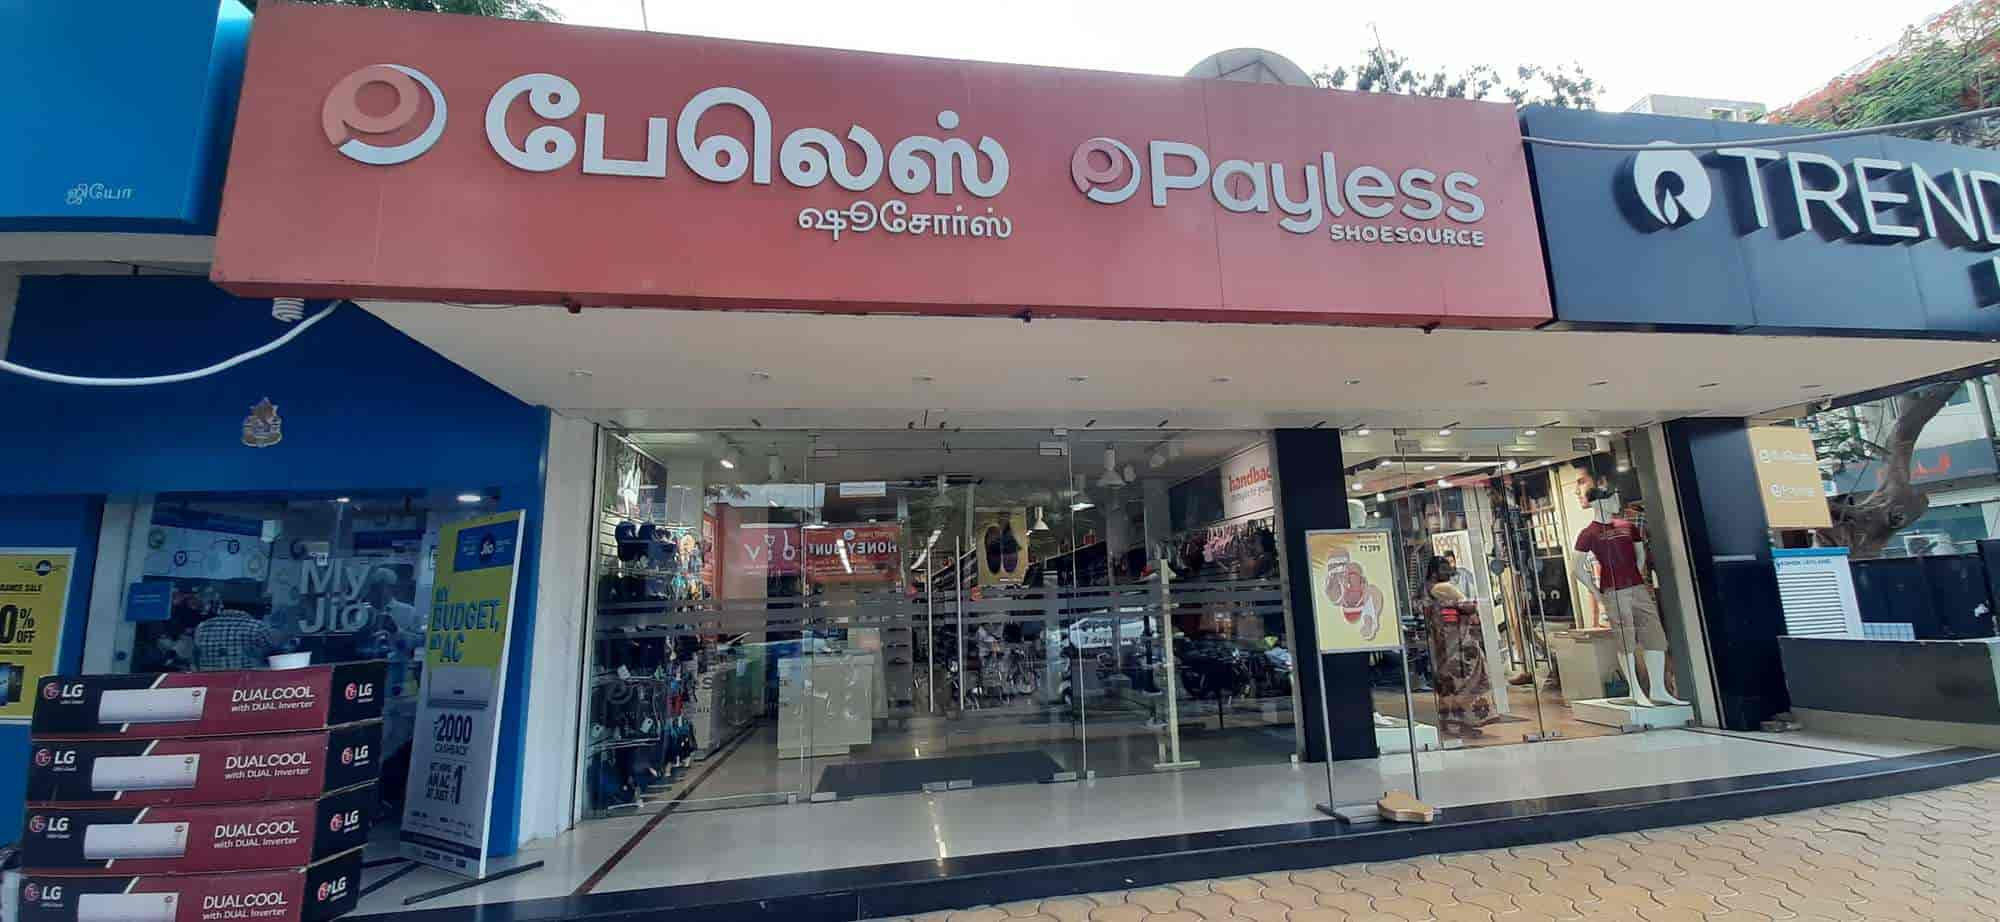 Payless Shoesource, Rs Puram Coimbatore